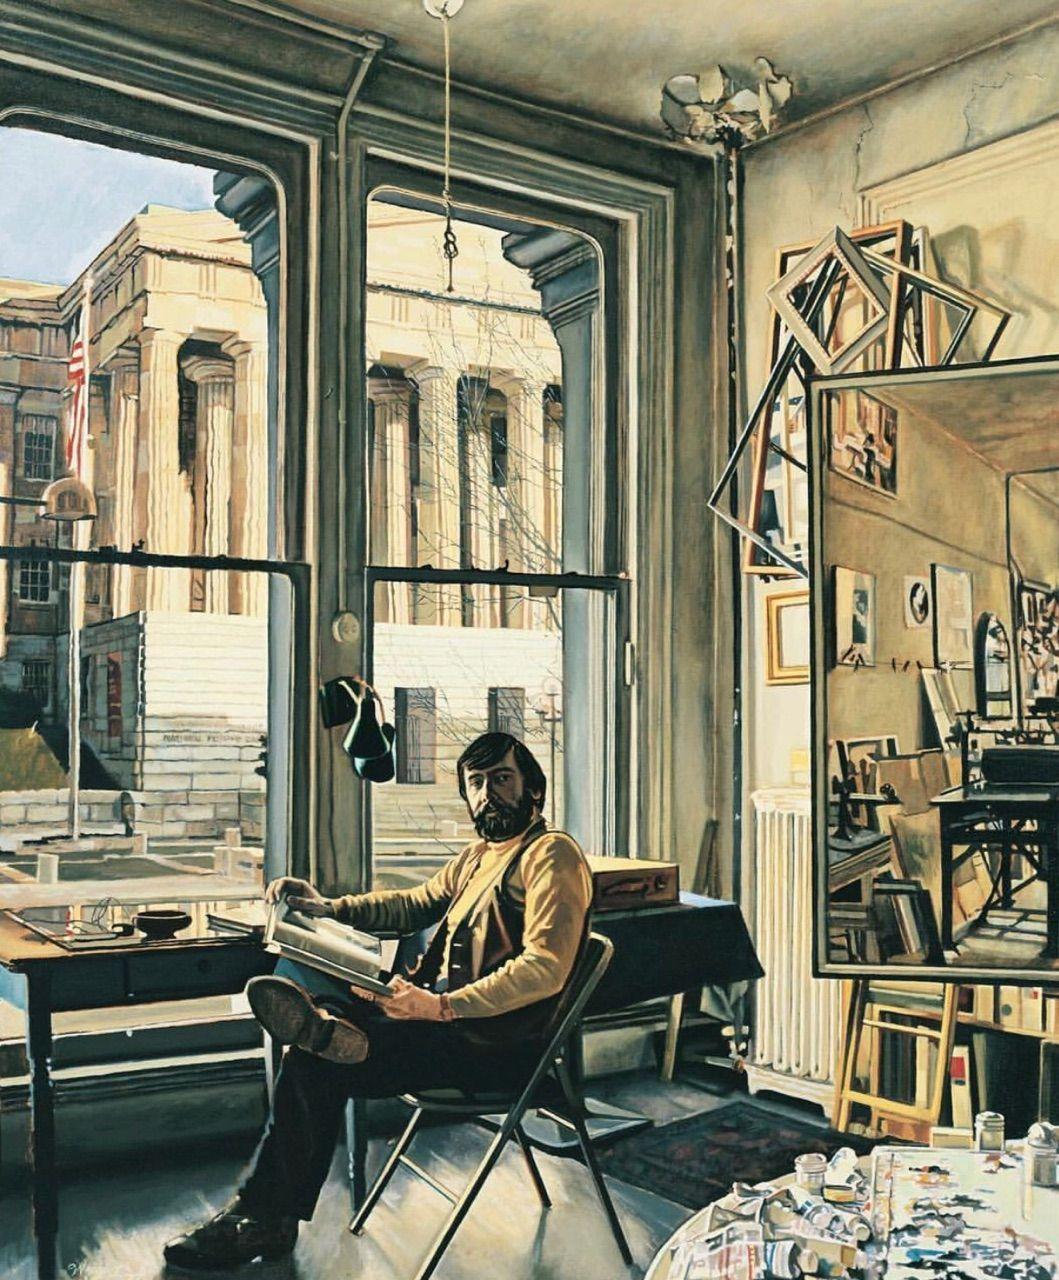 The Original Selfie The Self Portrait Nationalselfieday Frank Wright The Artist In His Studio 1977 Oil On Canvas Morrismuseu Art Museum Artist Art